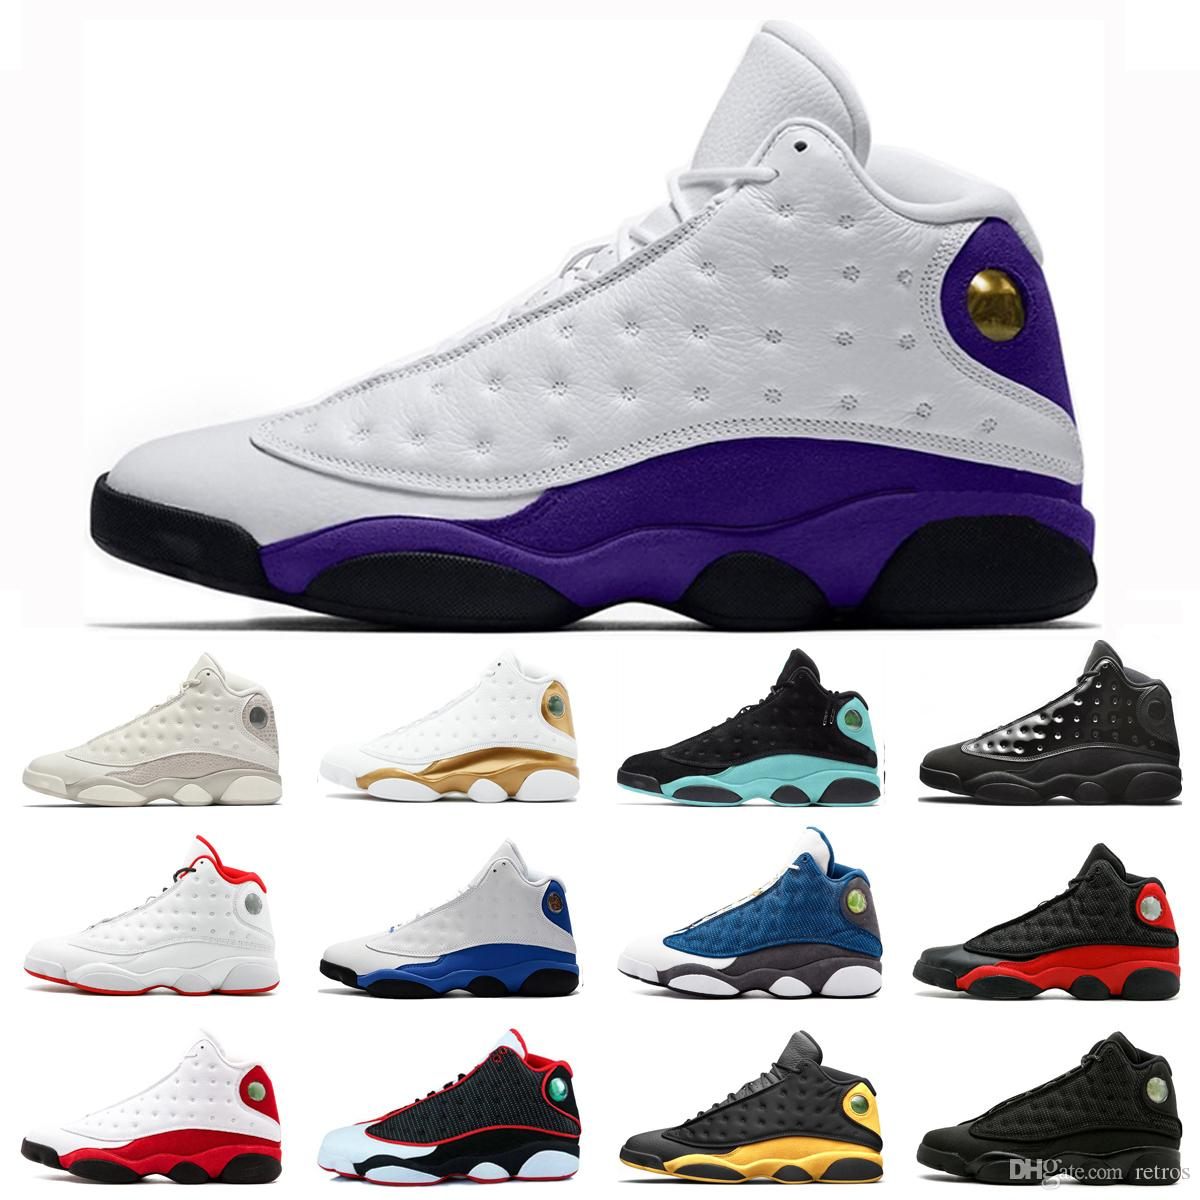 Hot Sale Court purple men Baksetball shoes 13 13s Hyper Royal He Got Name Flint Chicago Cap and Gown Black Cat Trainer Sneakers